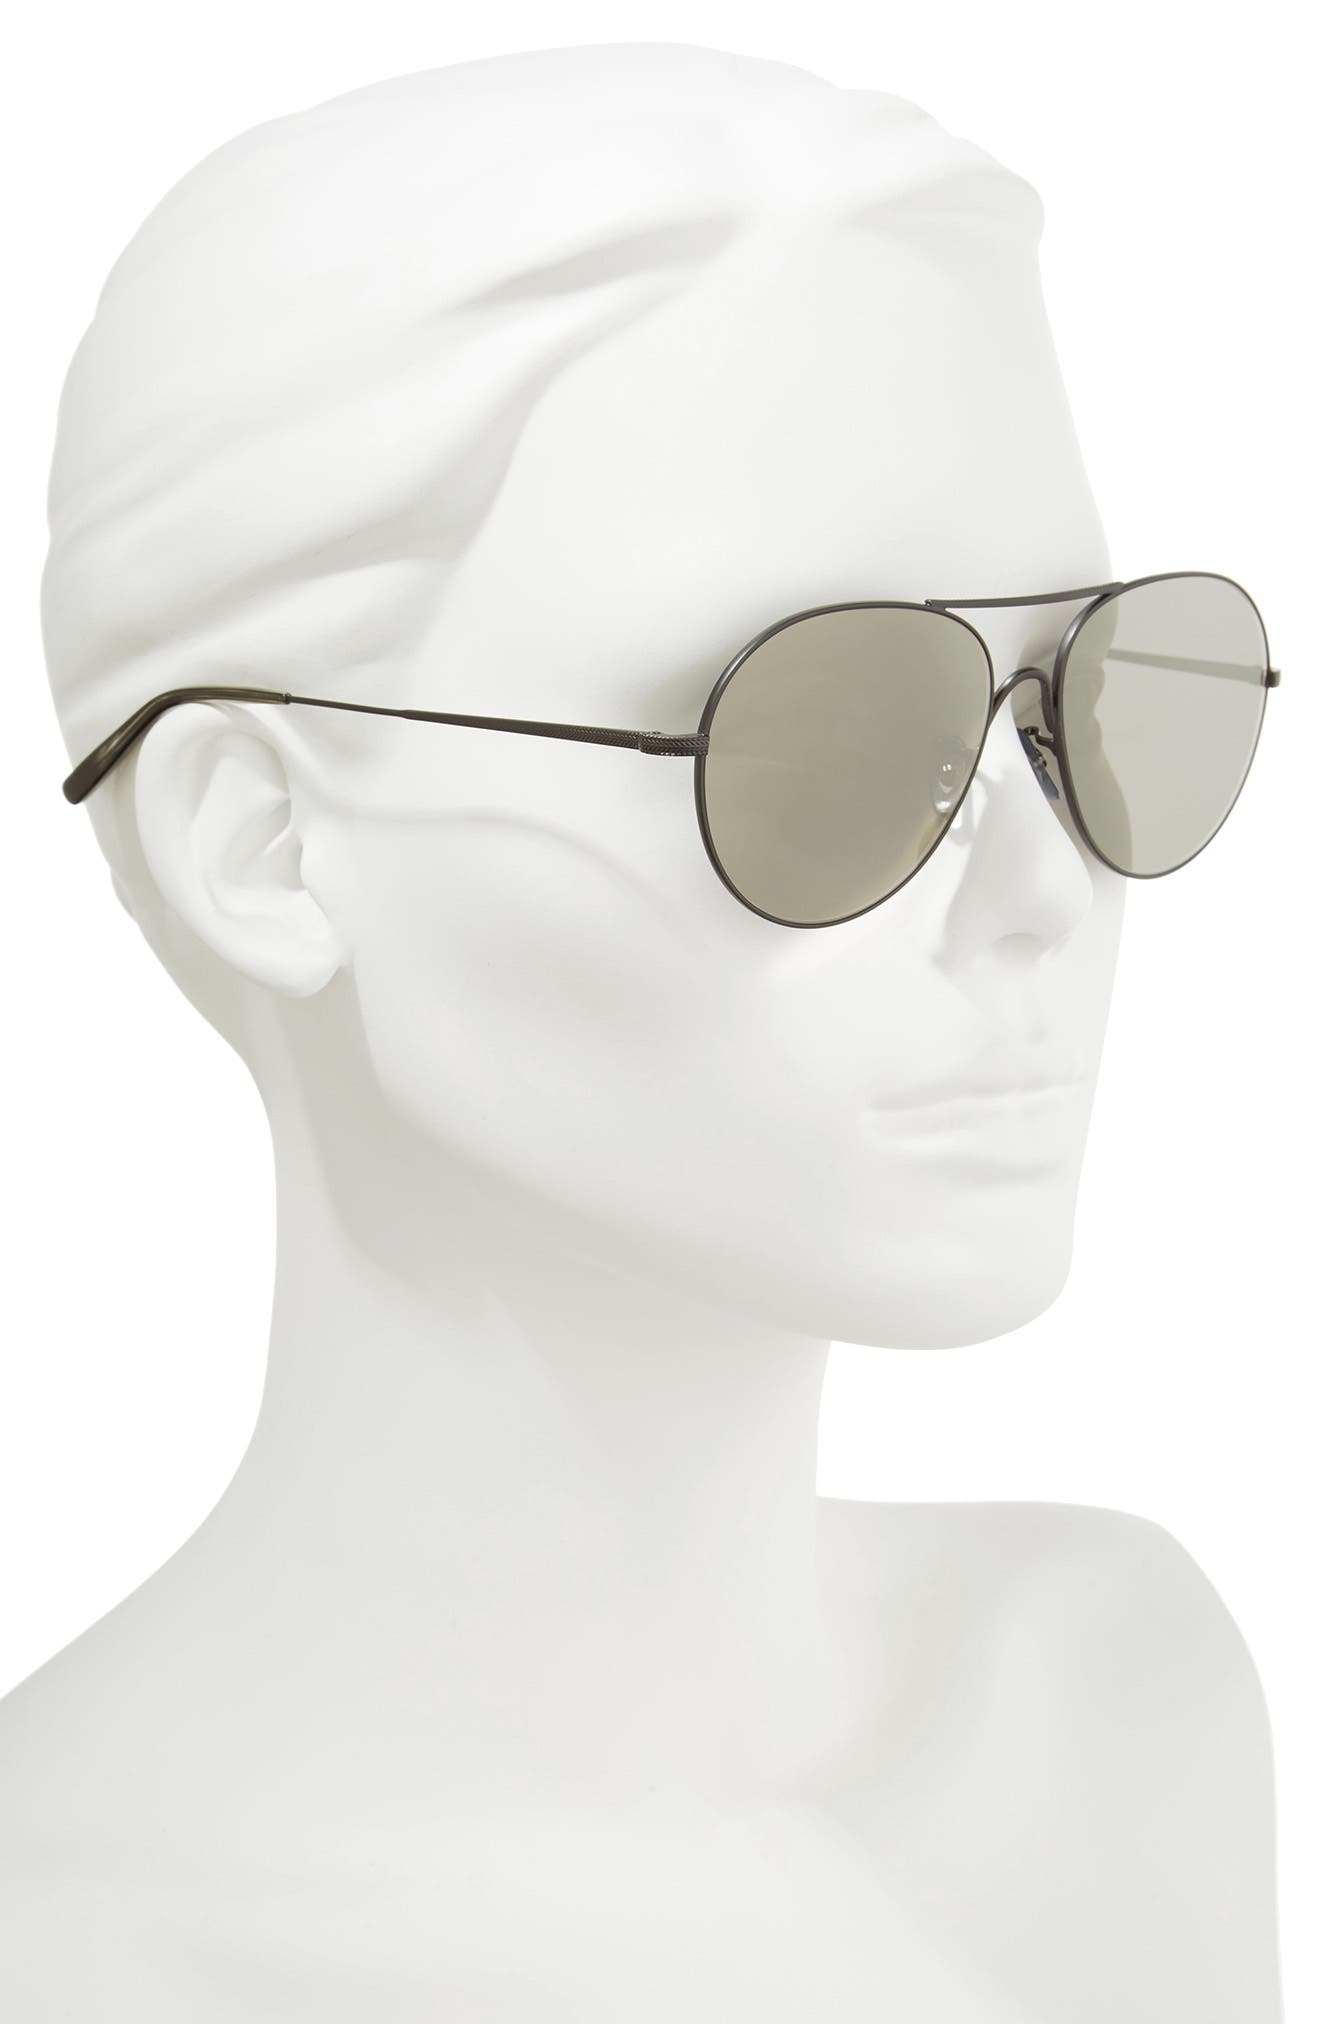 Rockmore 58mm Aviator Sunglasses,                             Alternate thumbnail 2, color,                             GREY